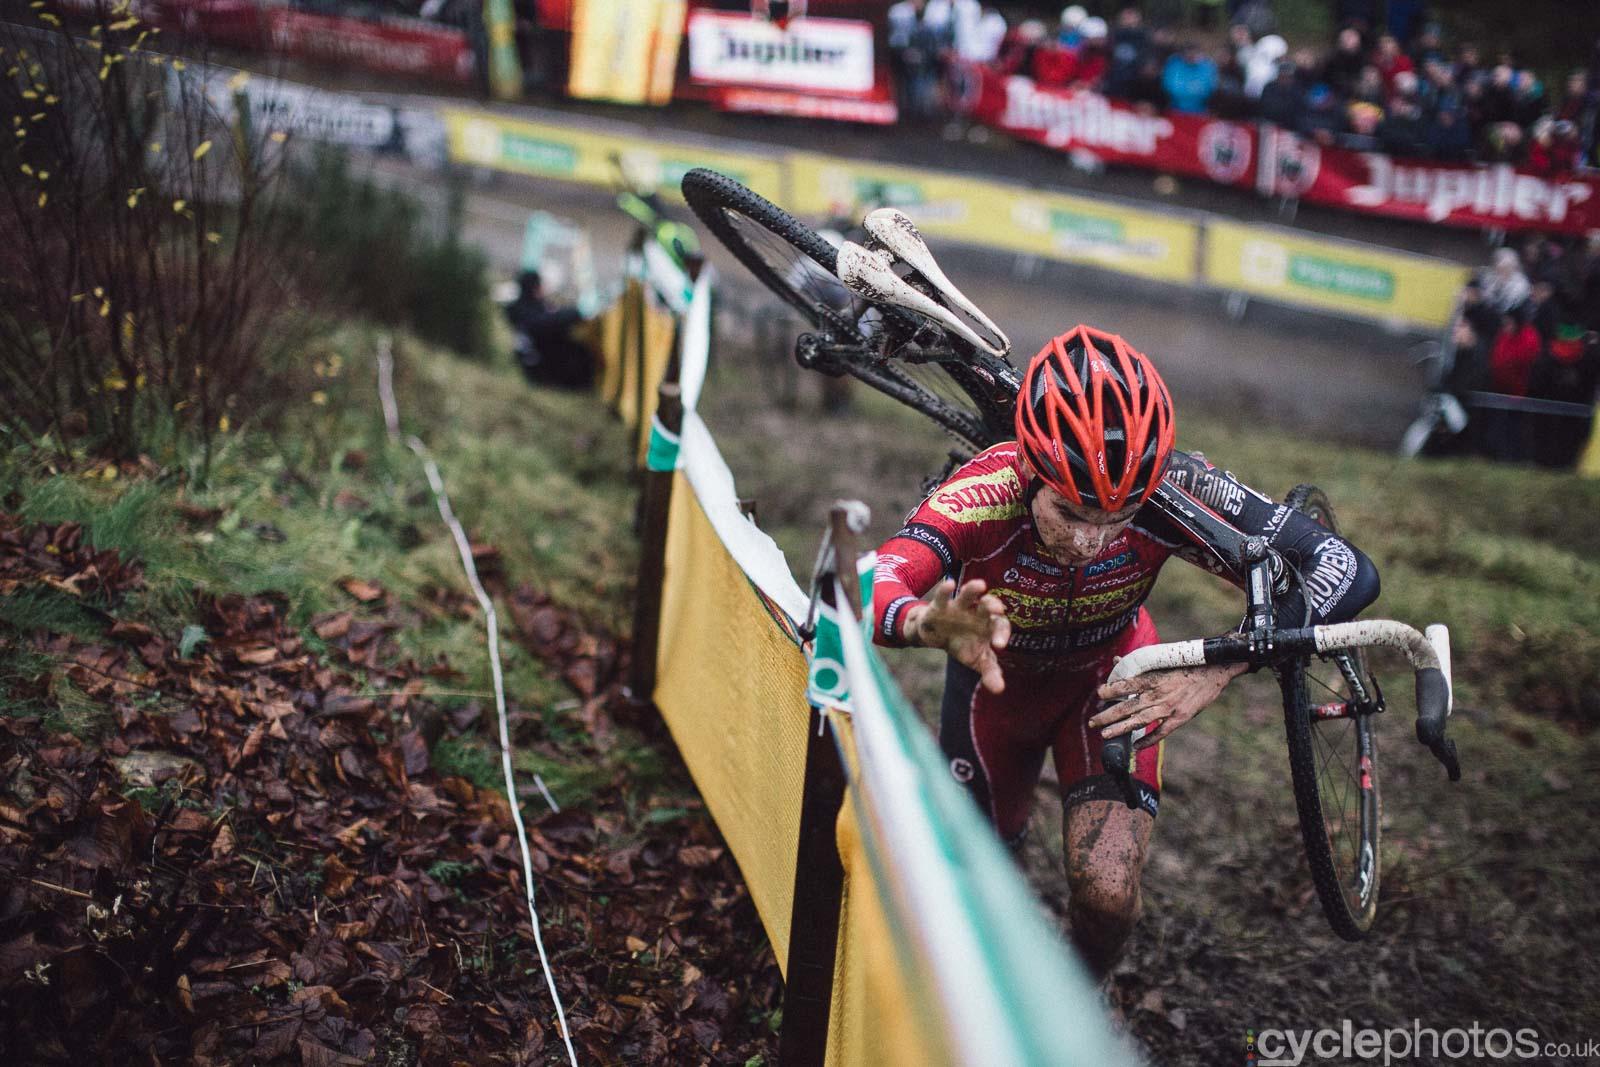 2015-cyclephotos-cyclocross-spa-152045-gianni-vermersch